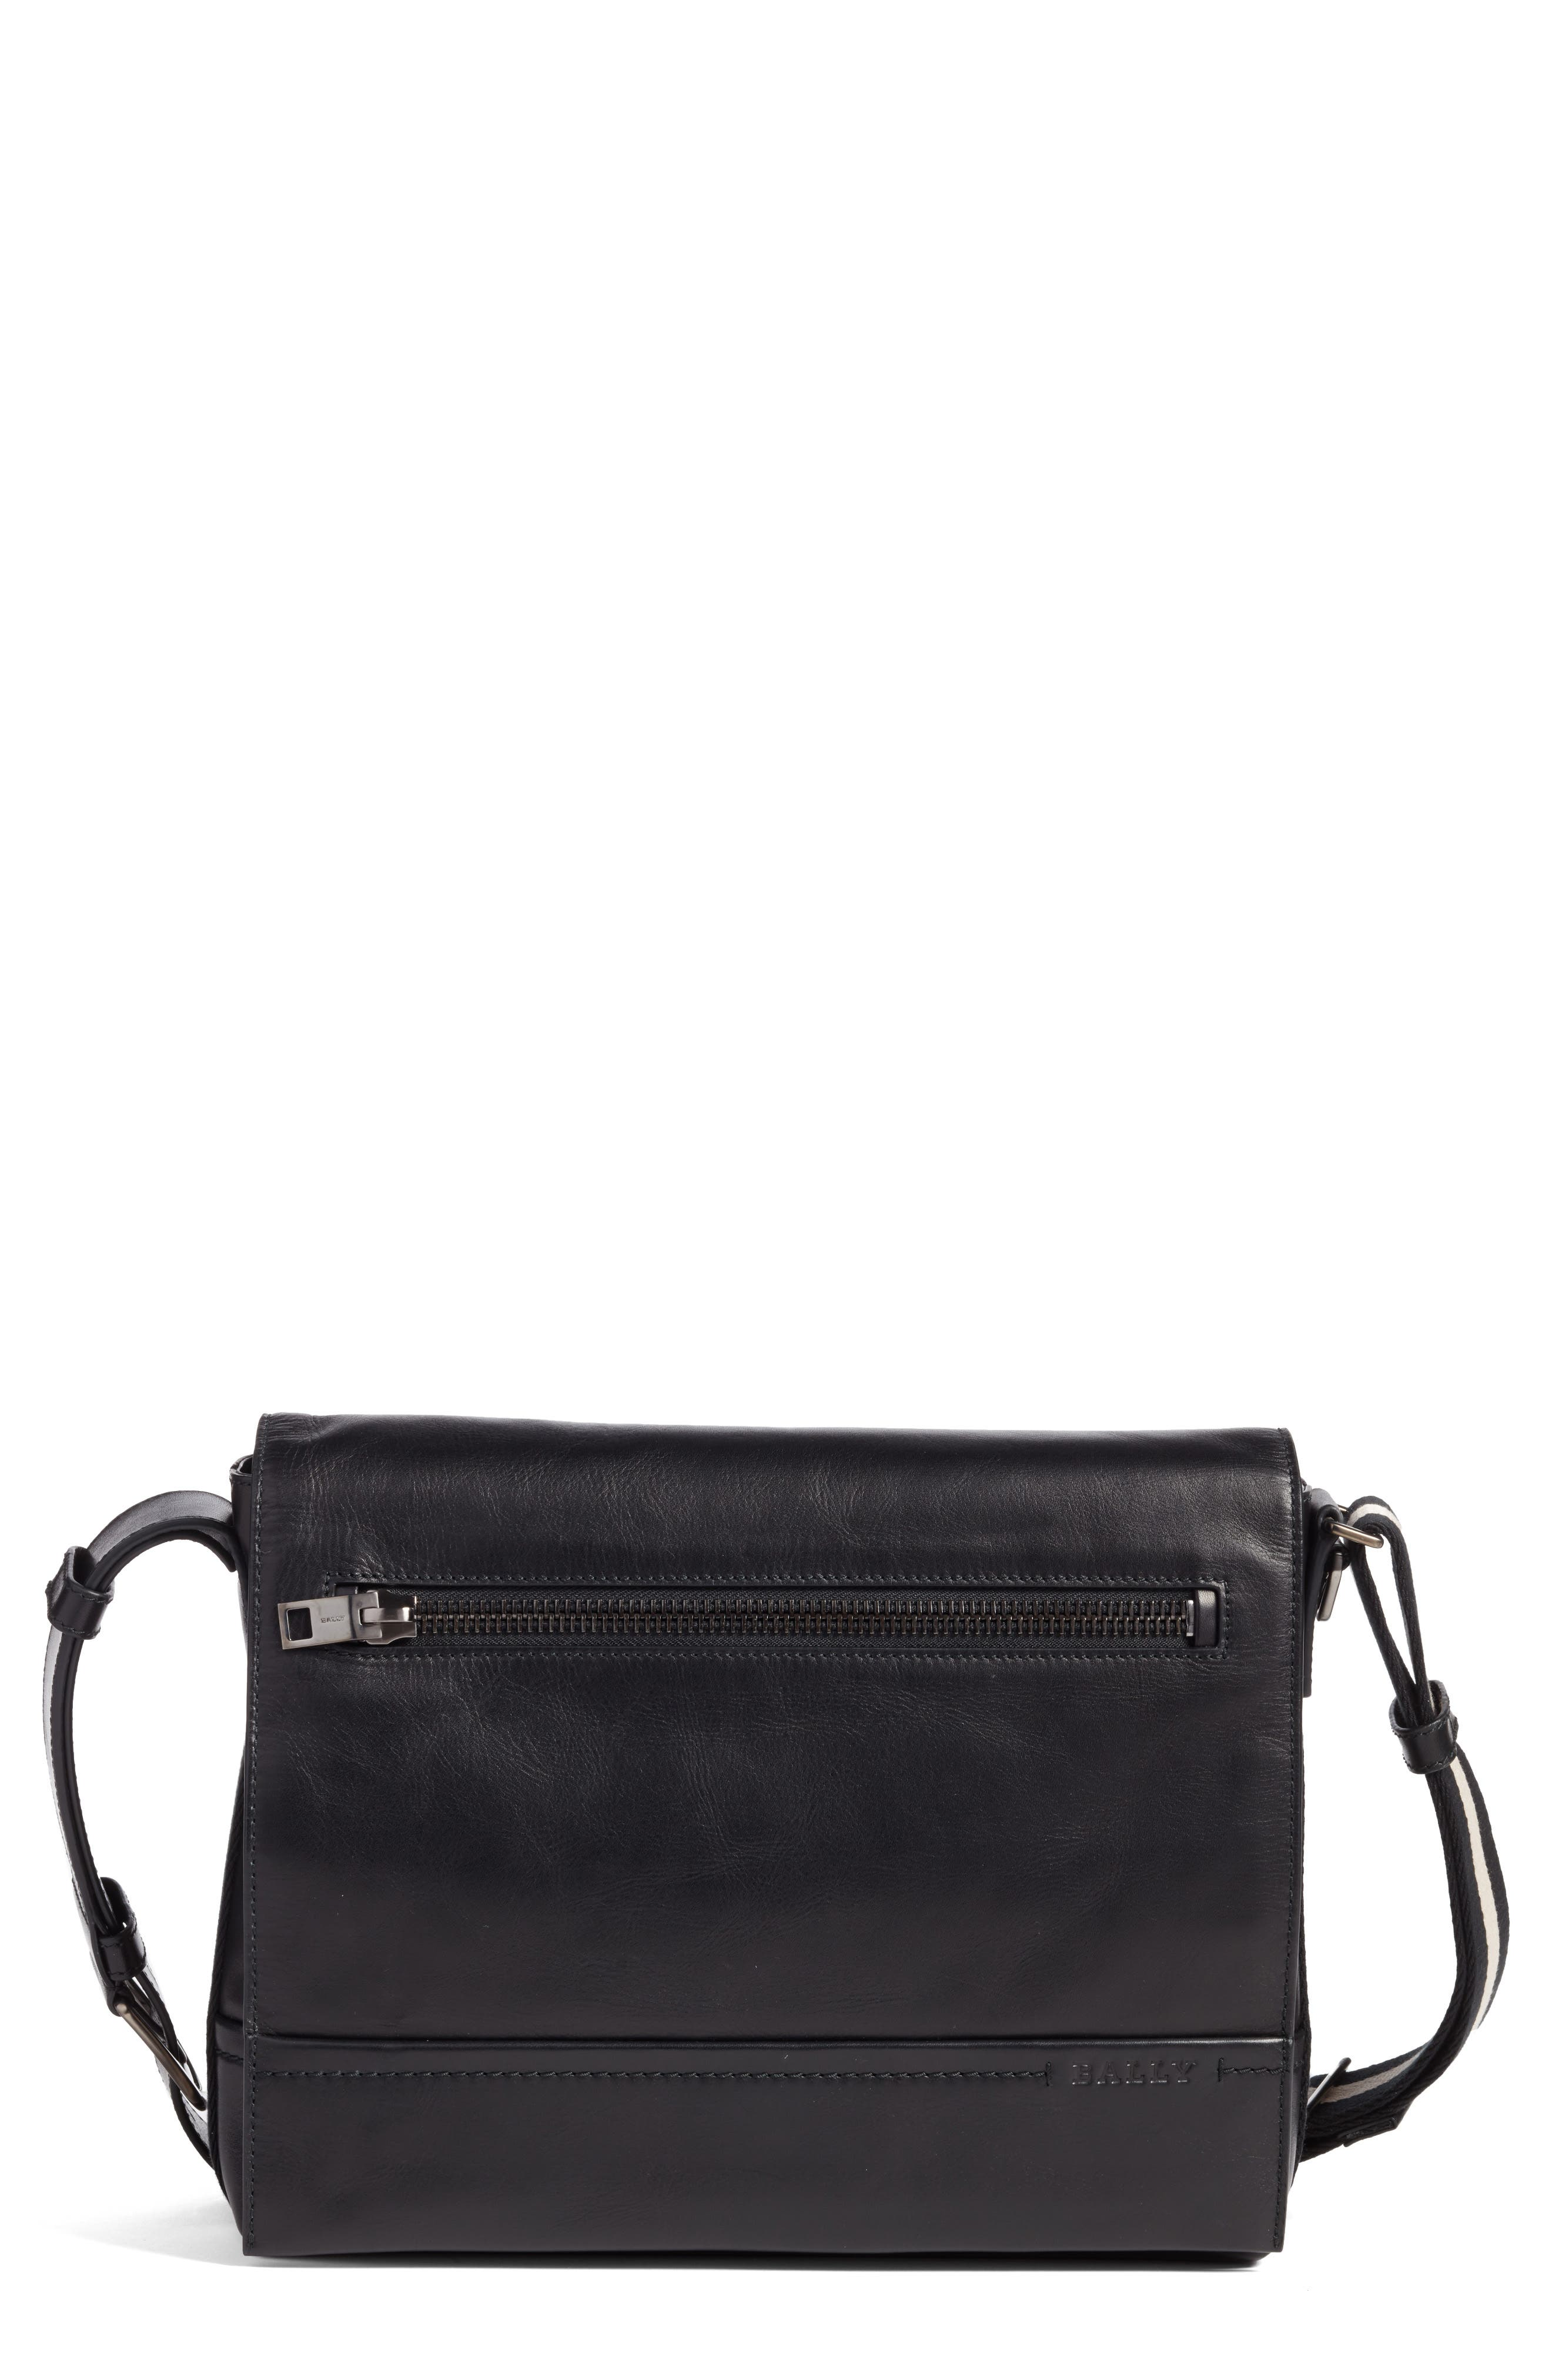 Main Image - Bally Tamrac Leather Messenger Bag